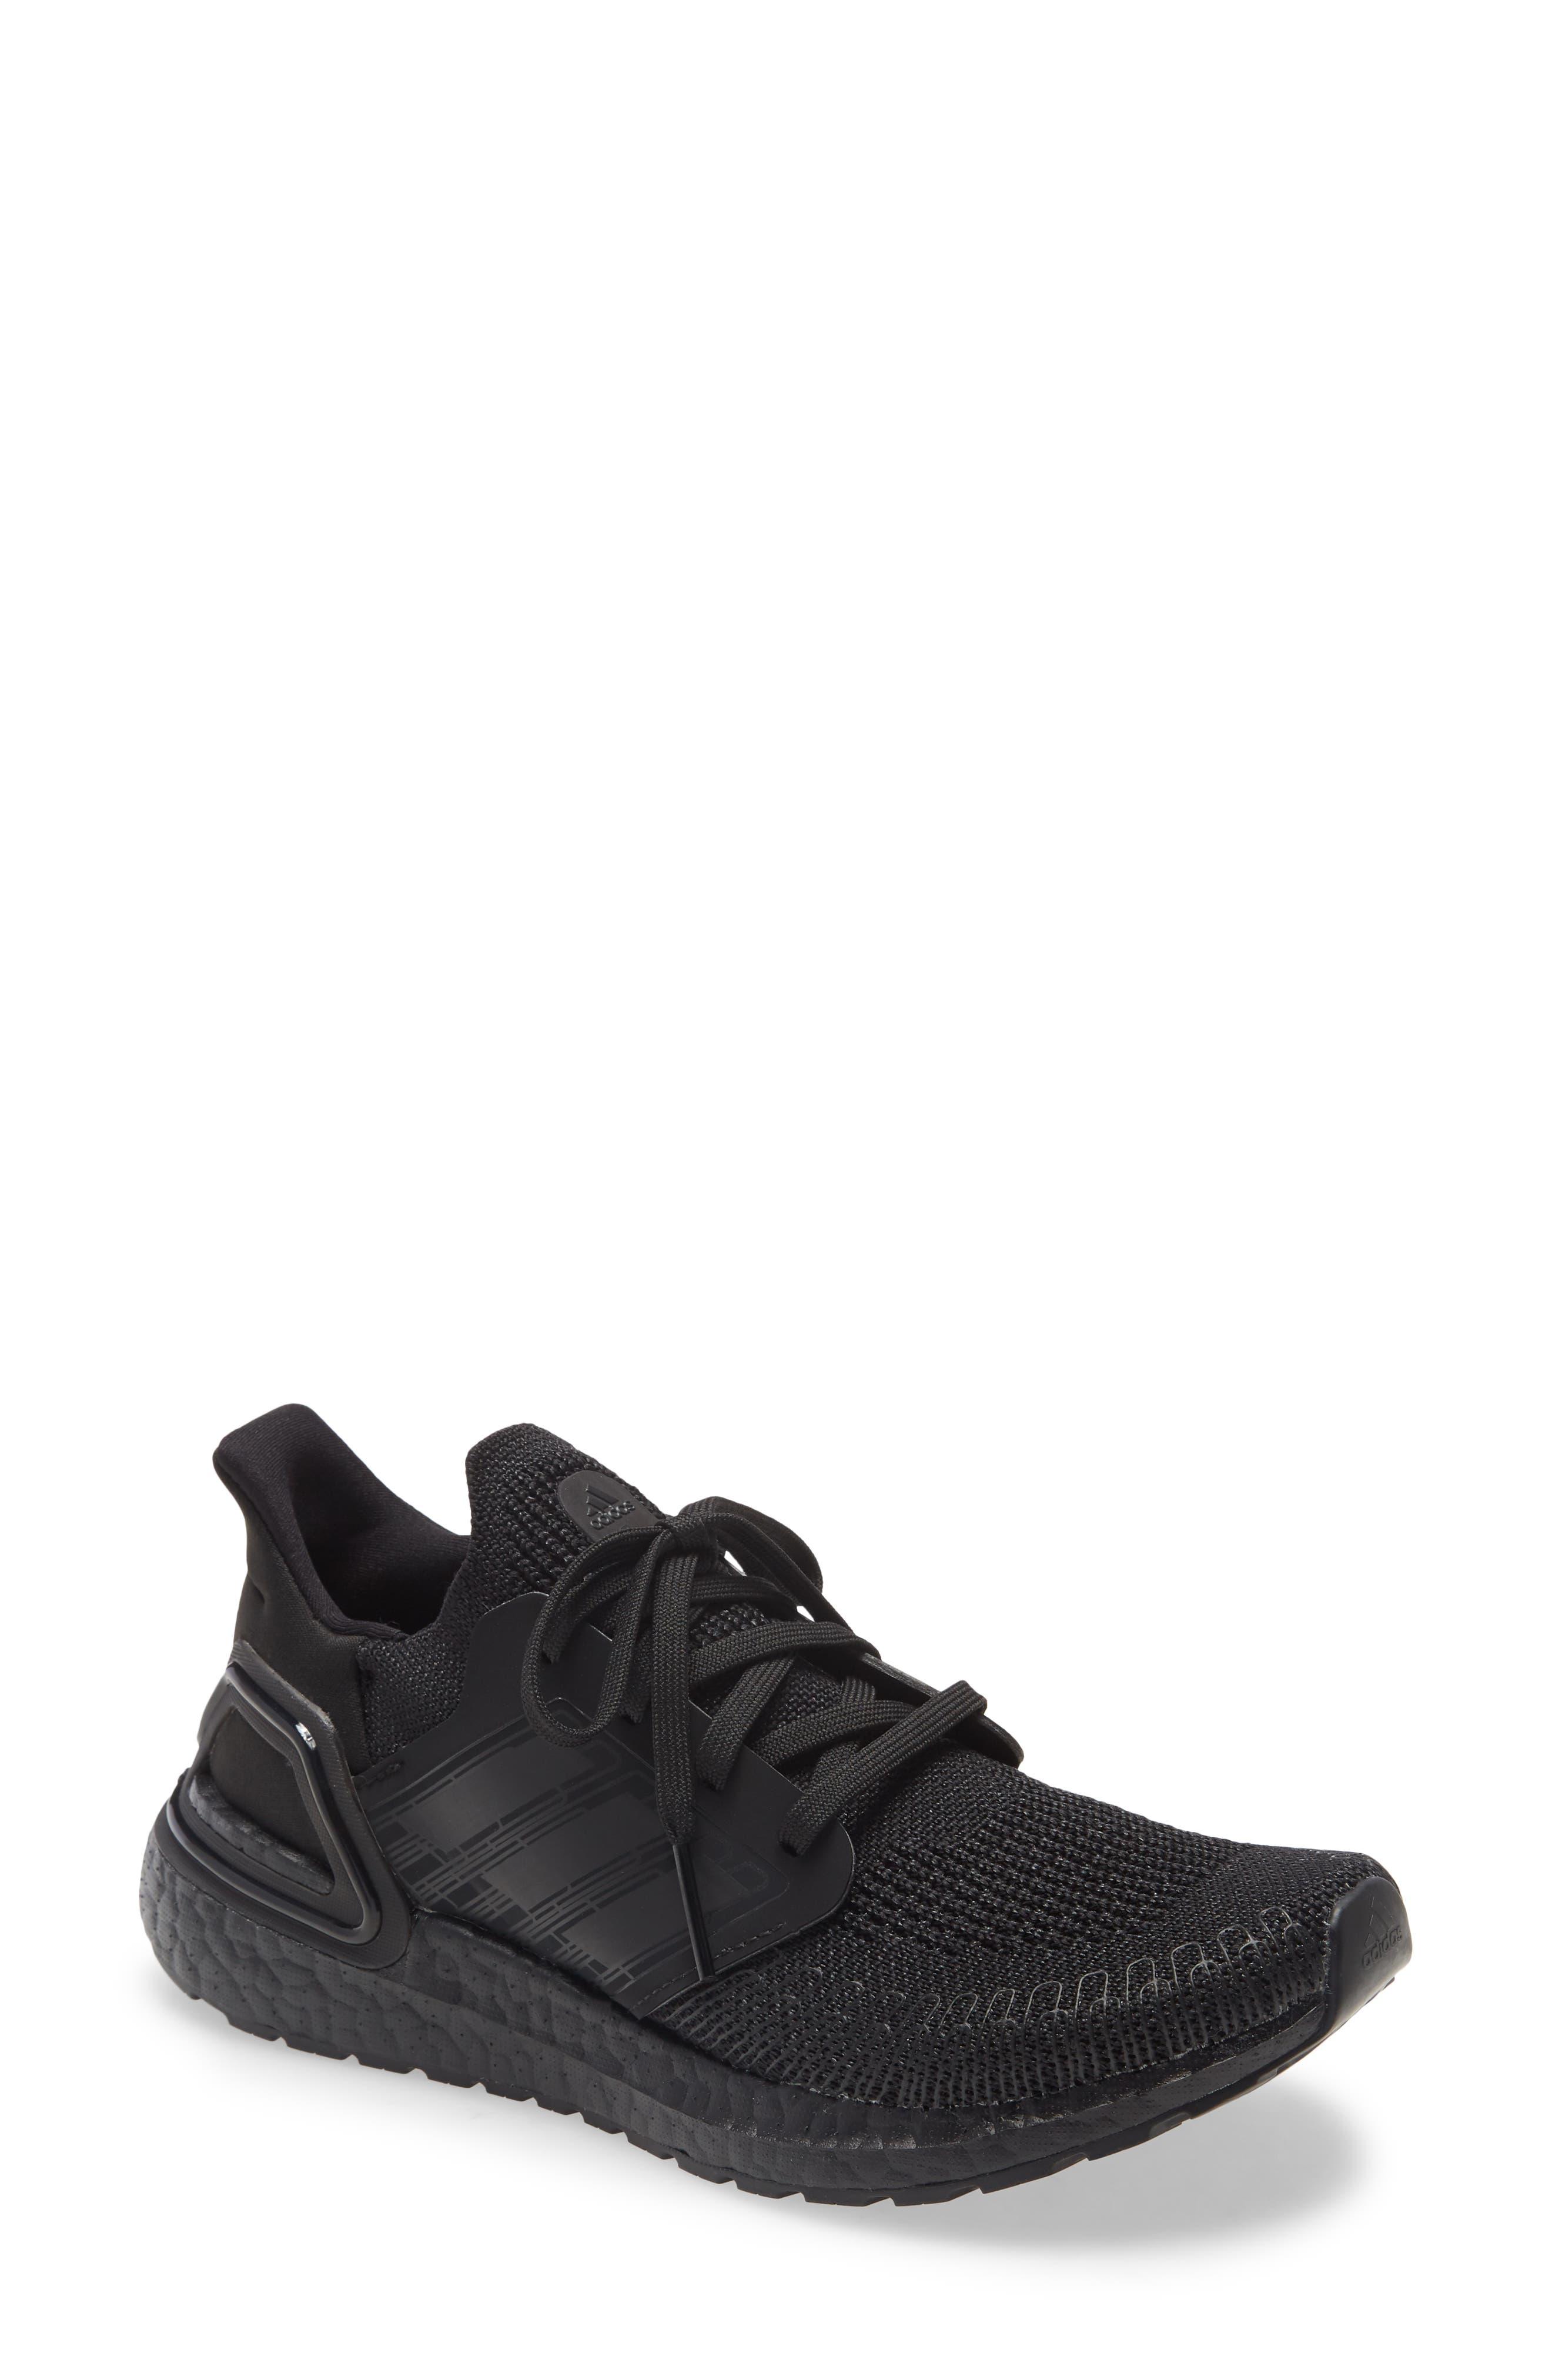 Image of adidas Ultraboost 2.0 Sneaker